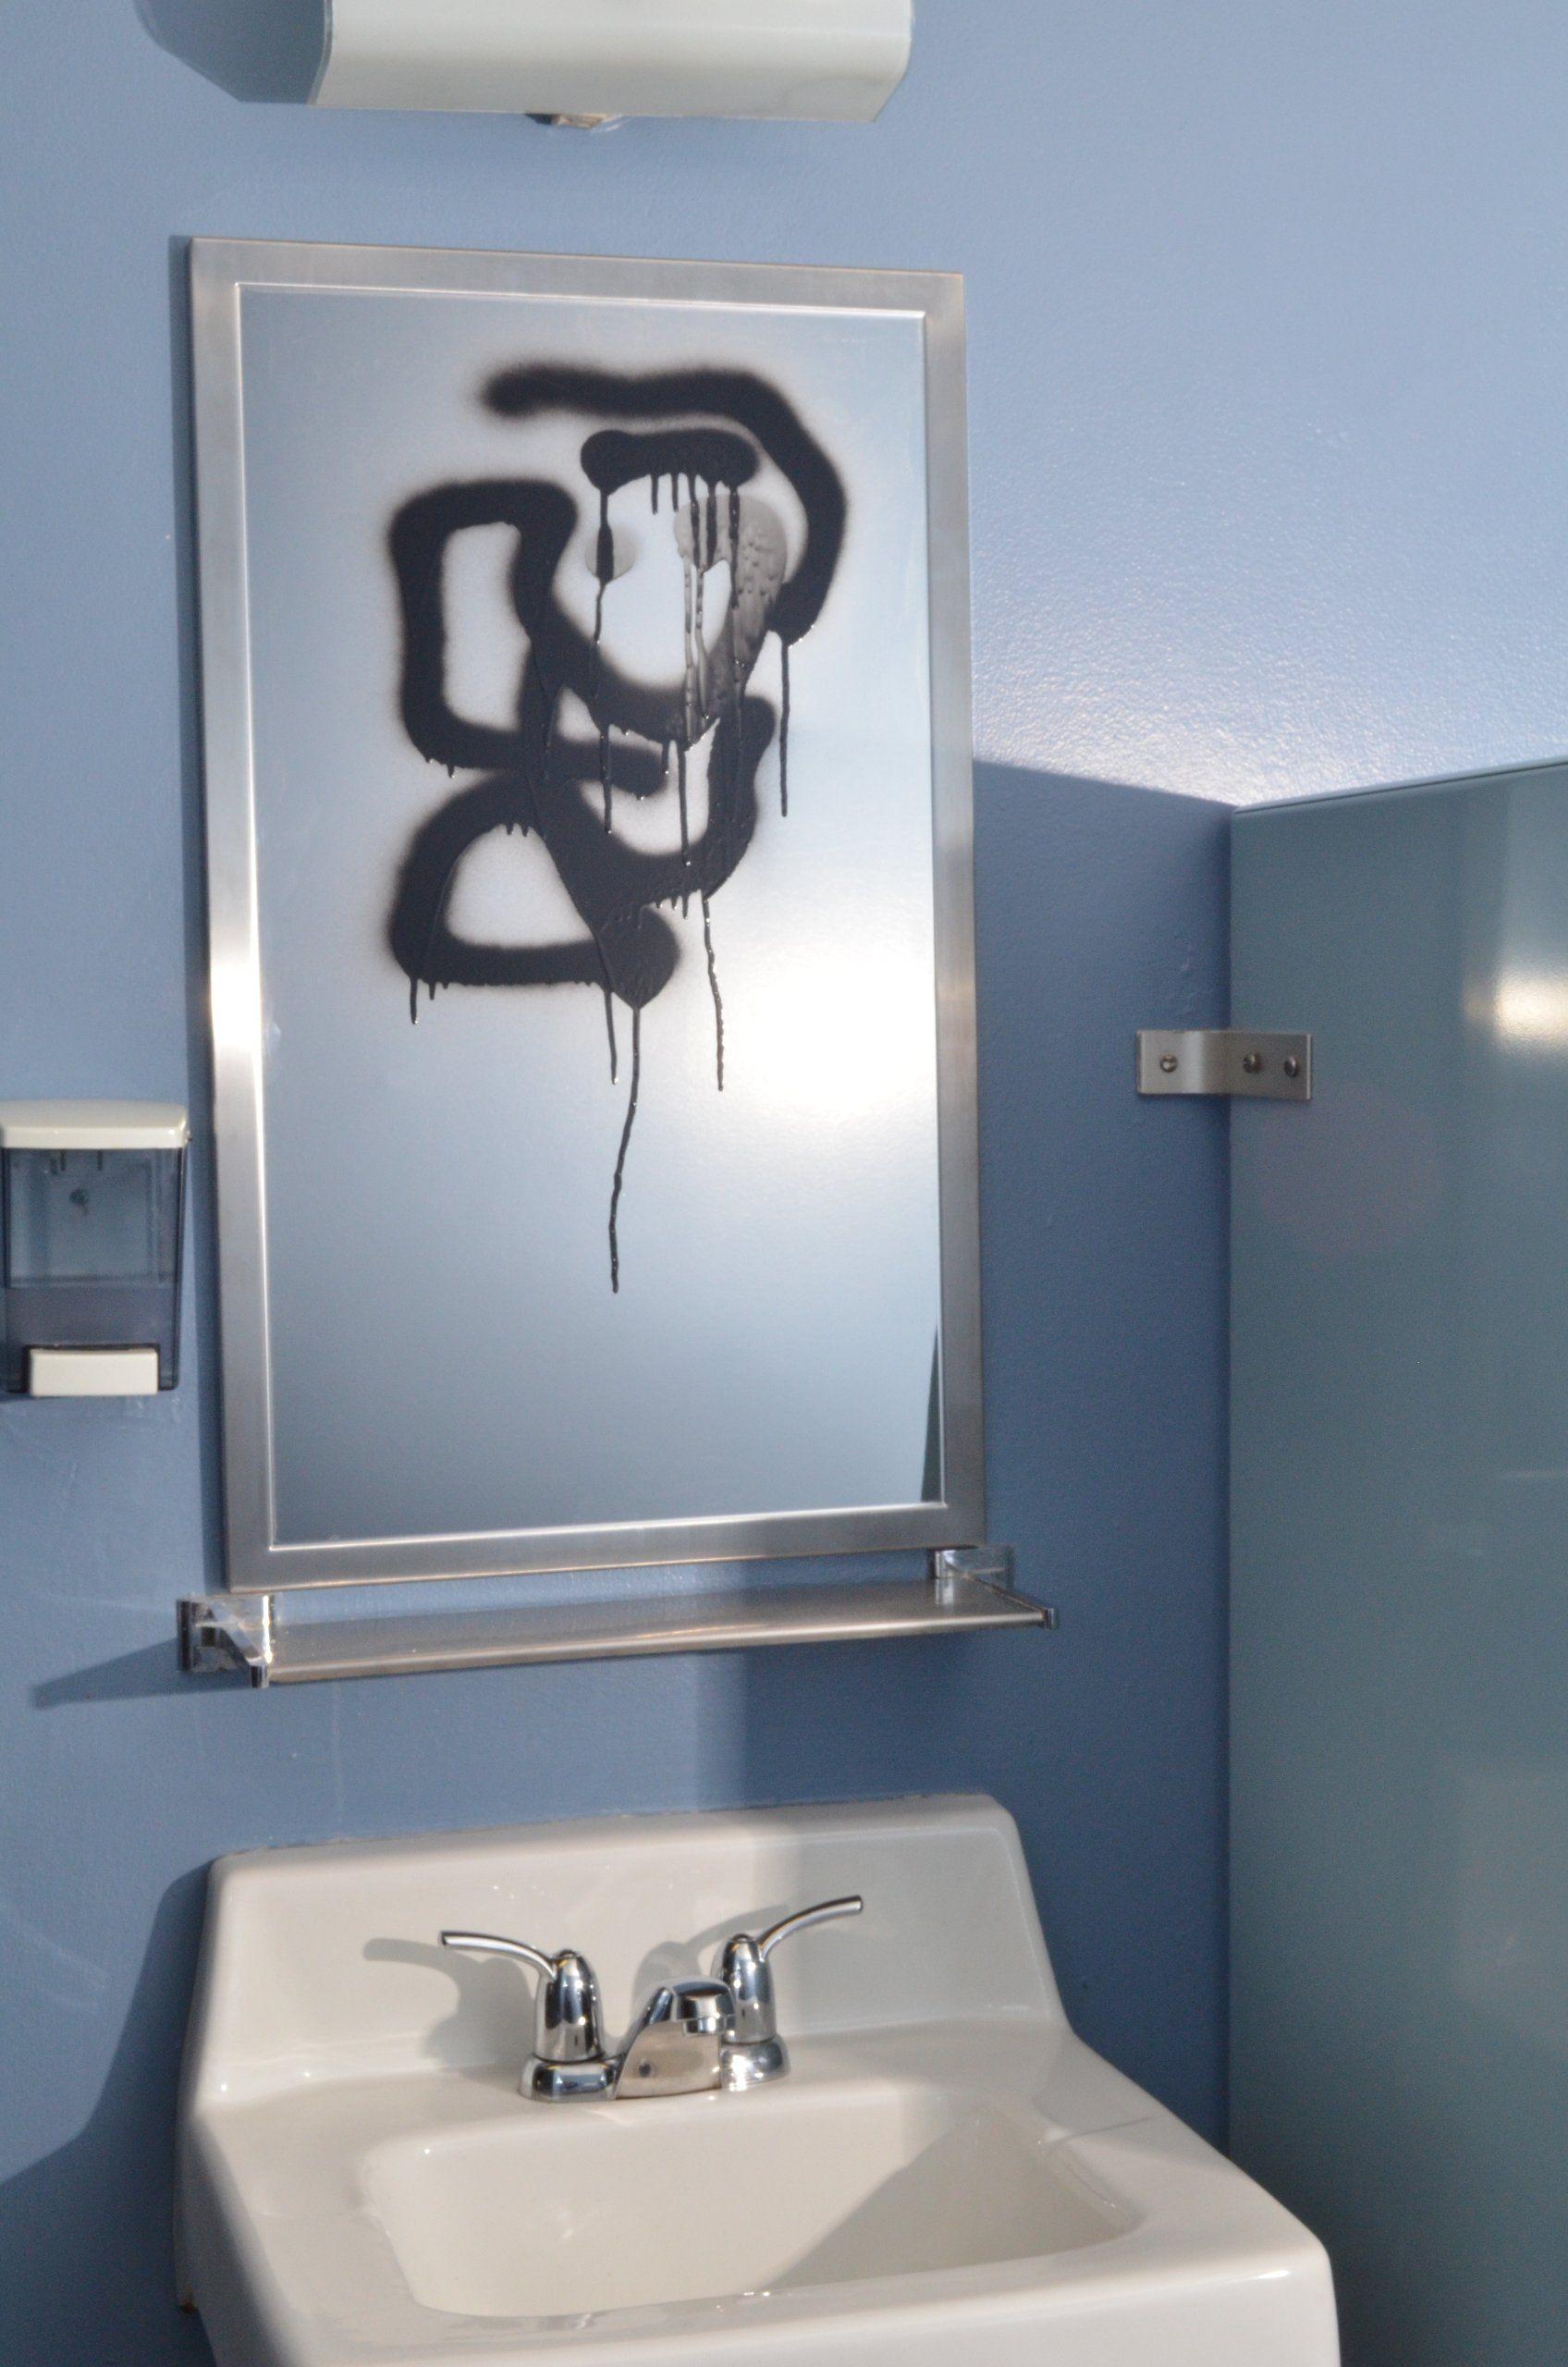 Safety AntiGraffiti Vandal Resistant